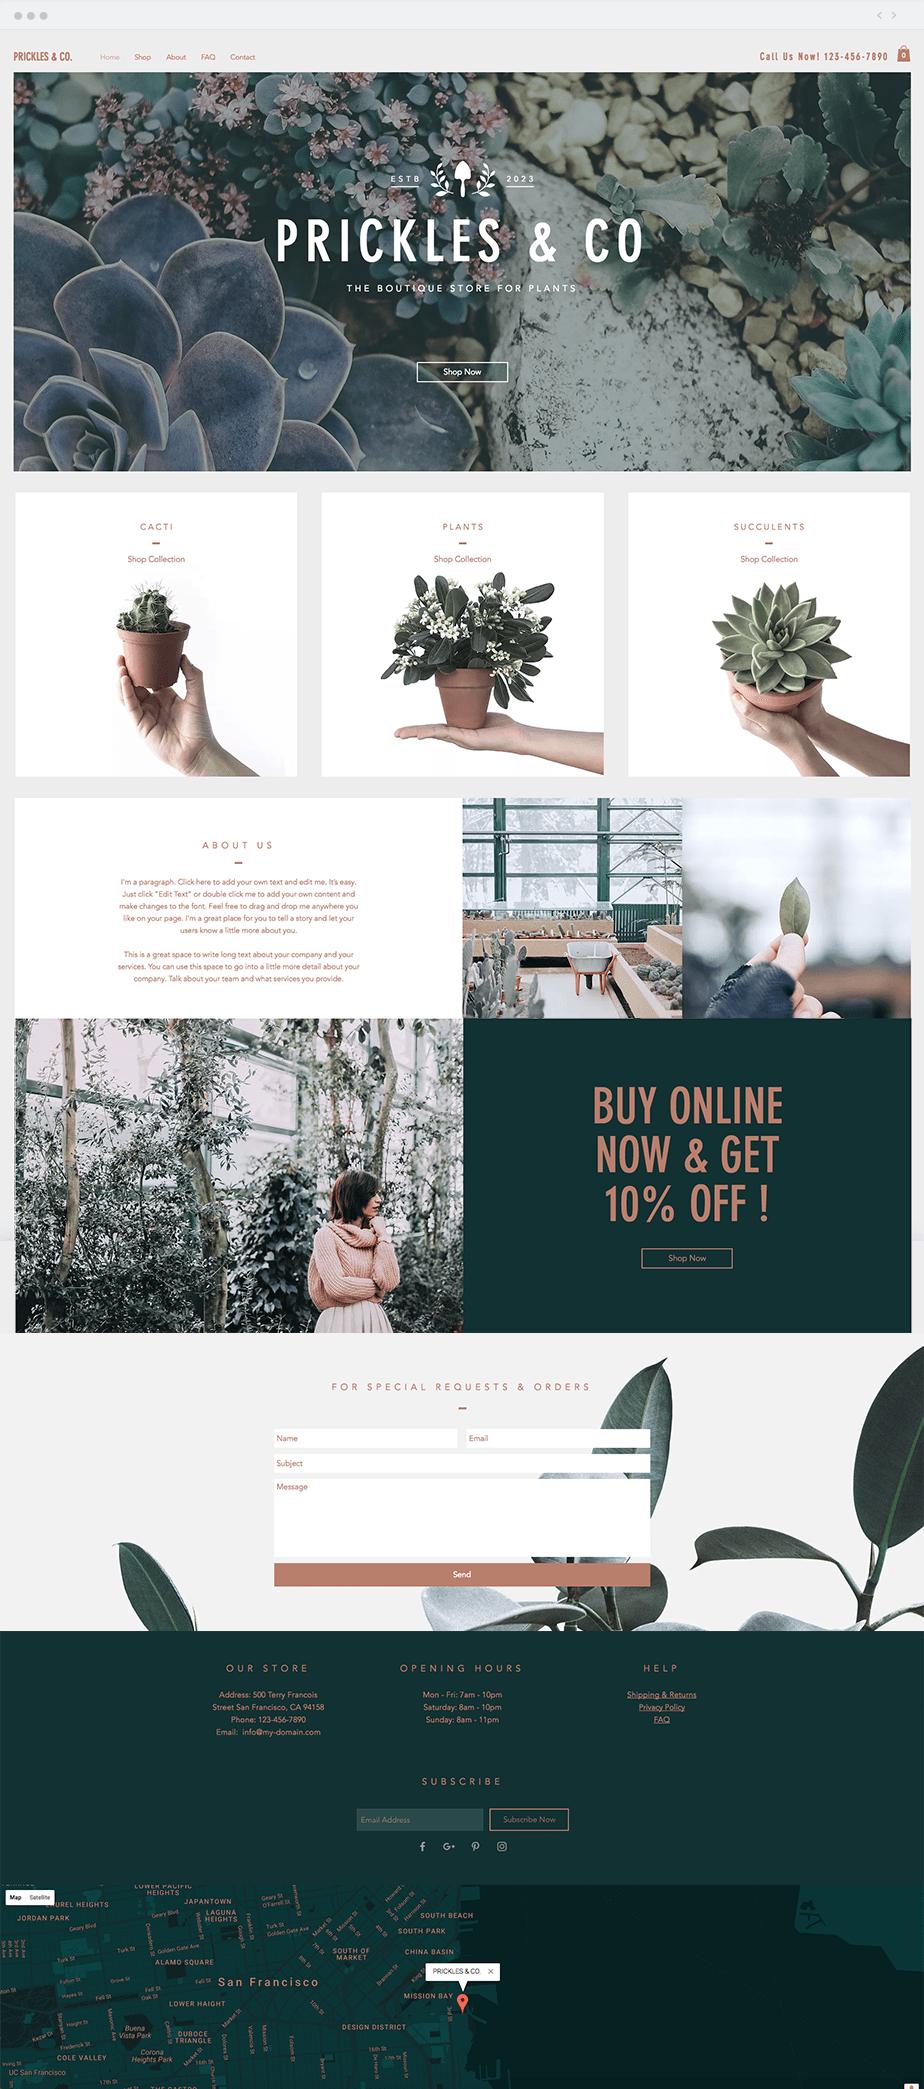 plant-store_prickles